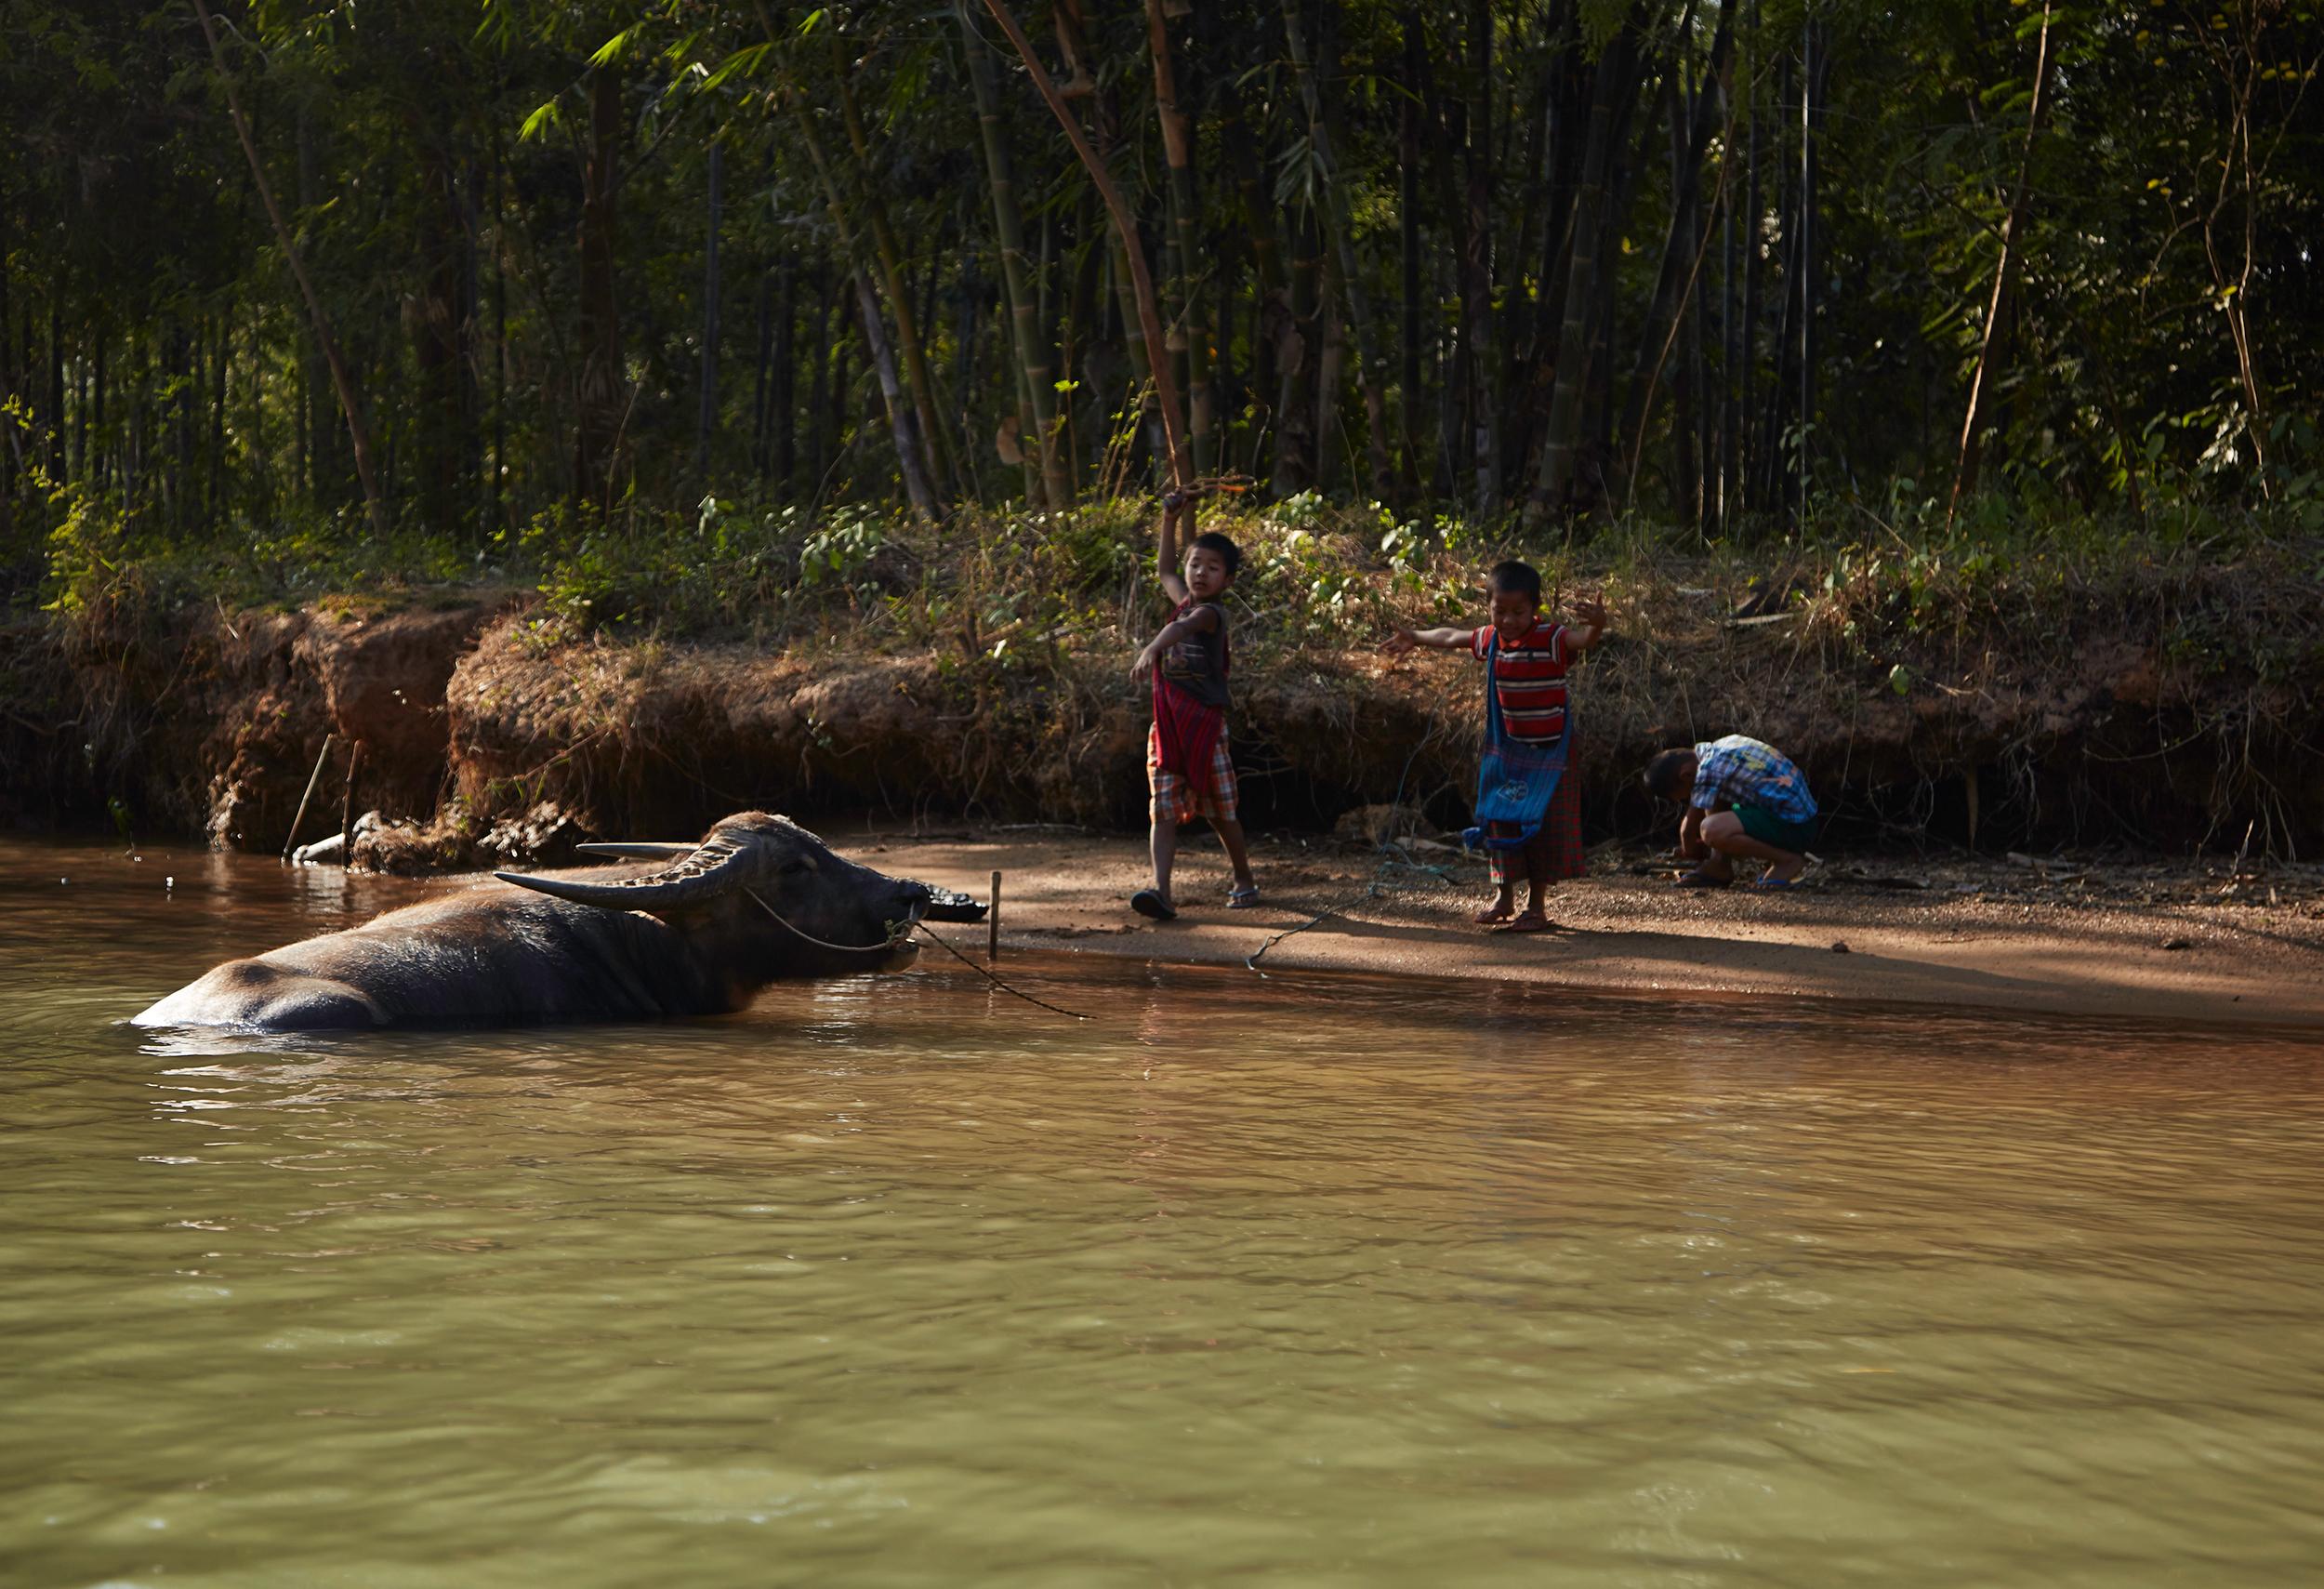 Kanjana-Chaiwatanachai-Image-Works_Mandalay-Riverside-2_2014.01.19_0027w.jpg